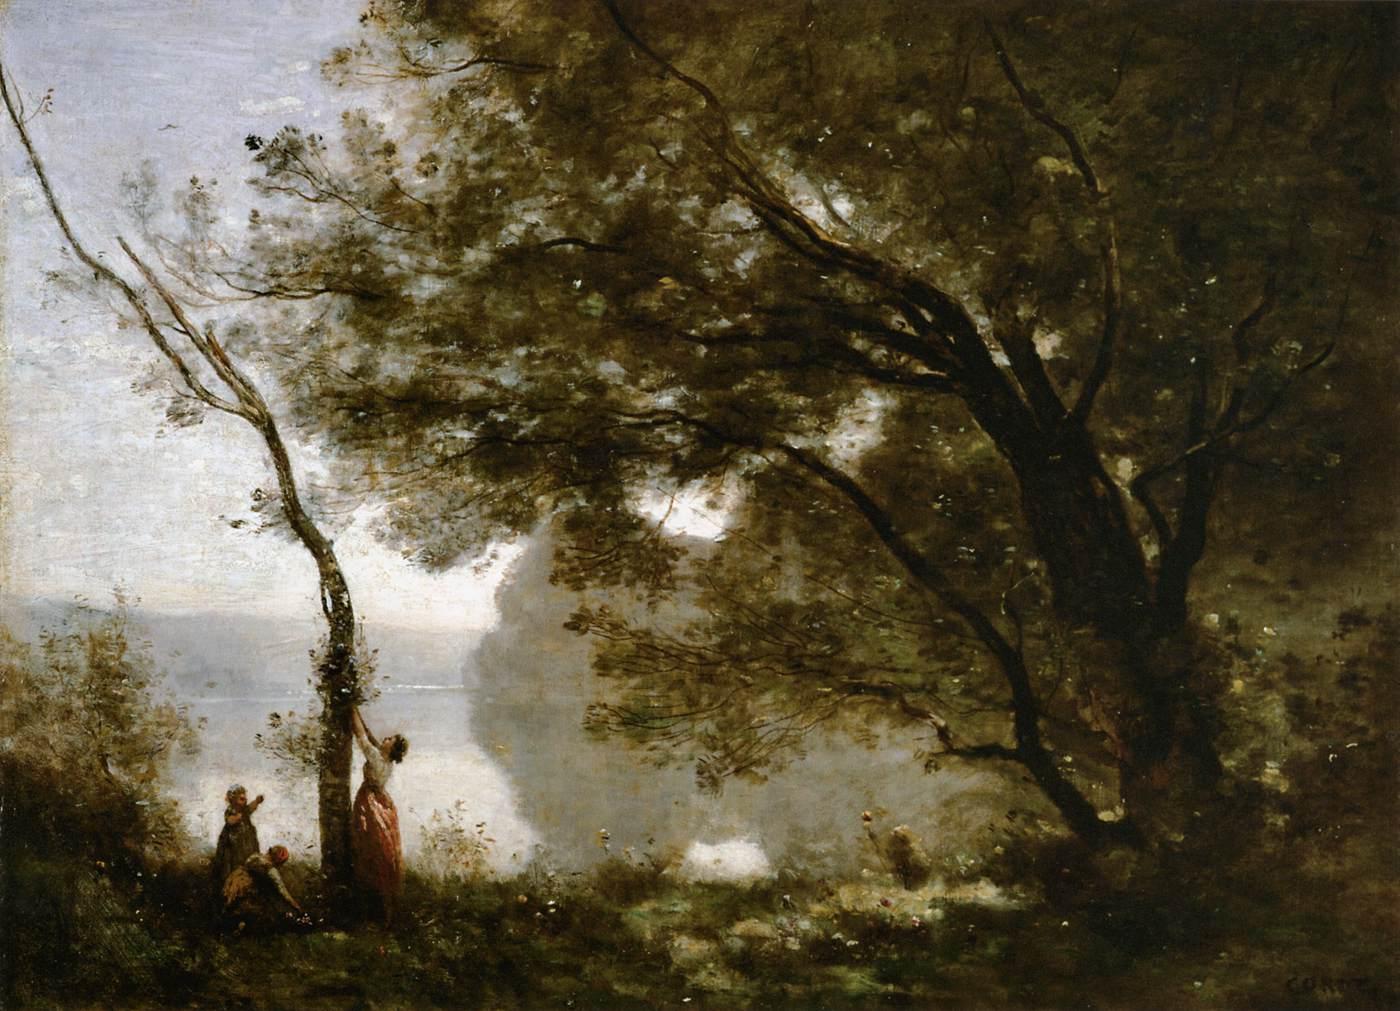 https://upload.wikimedia.org/wikipedia/commons/c/c0/Jean-Baptiste-Camille_Corot_-_Souvenir_of_Mortefontaine_-_WGA5292.jpg